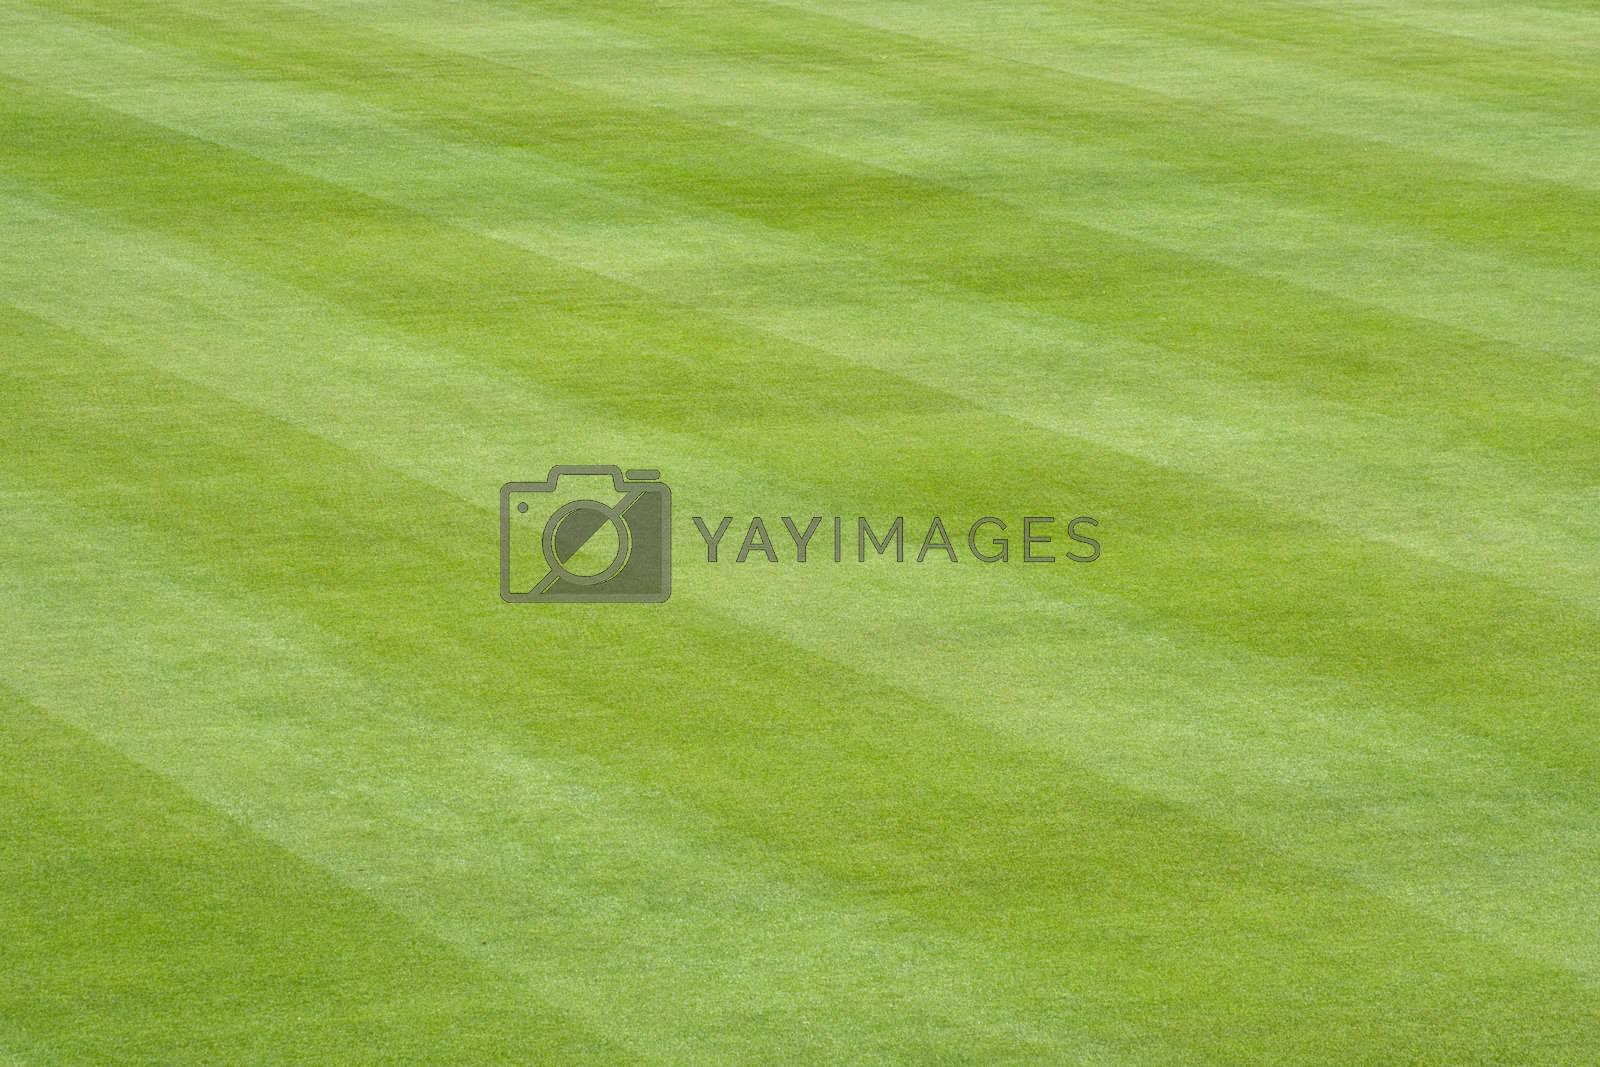 Baseball Field Grass by jclardy